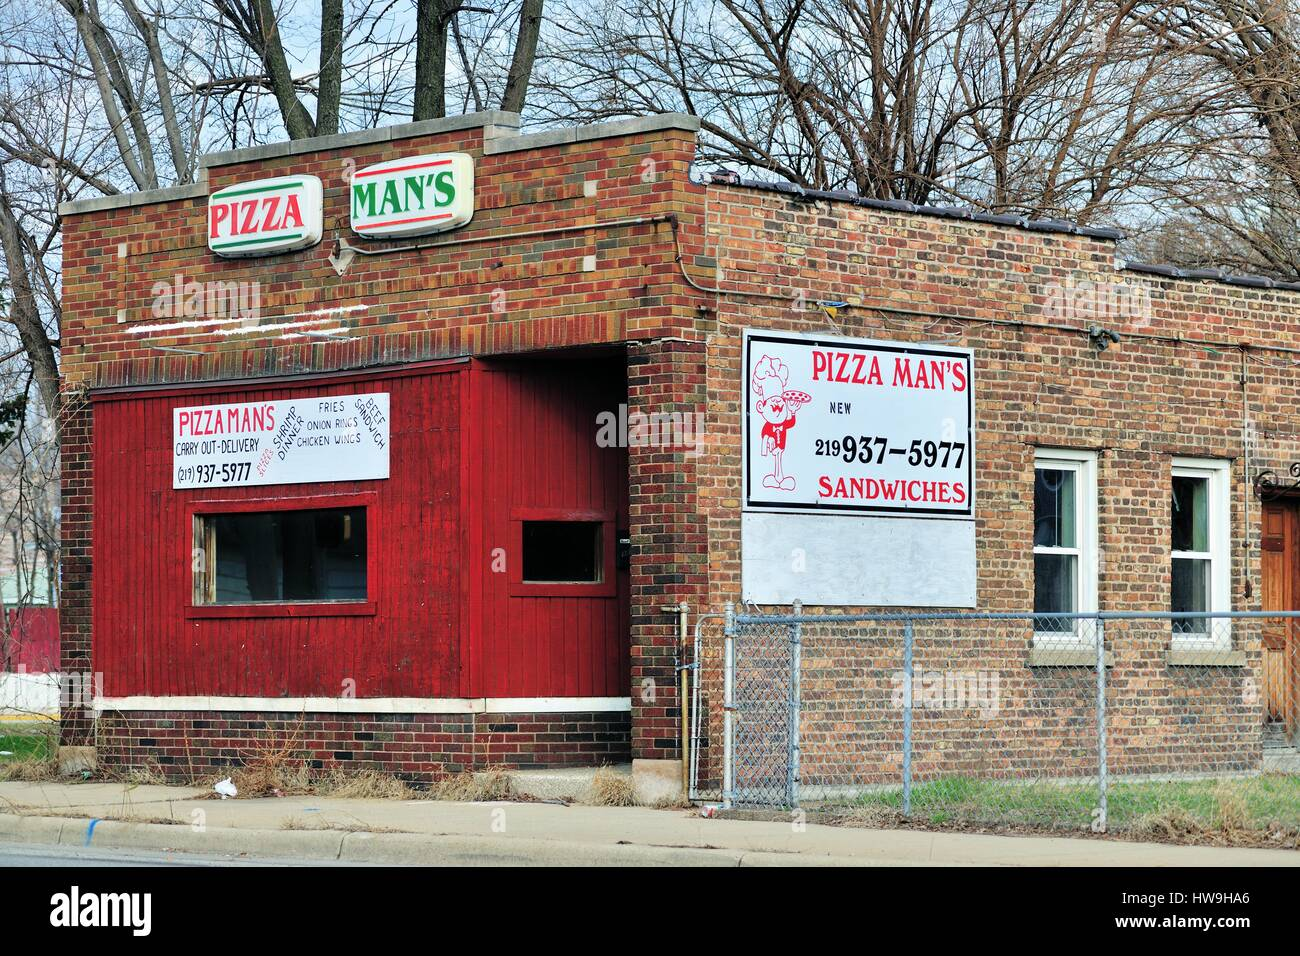 Inner city pizza establishment in Hammond, Indiana. - Stock Image